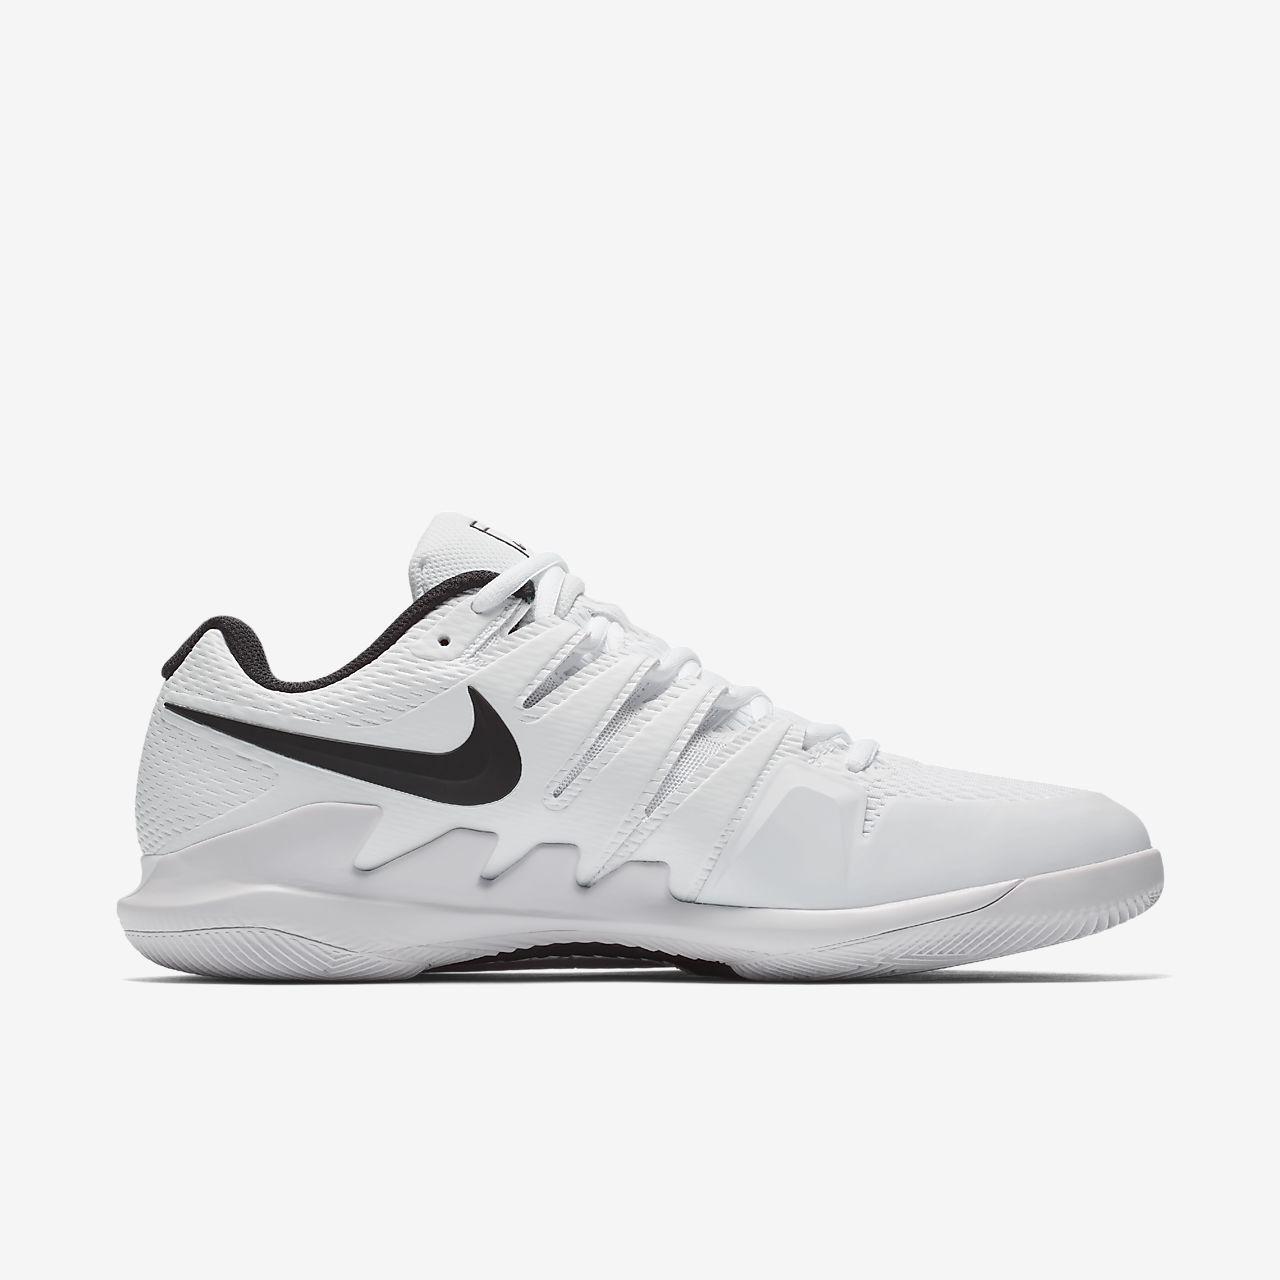 Zapatos Nike Vapor Zoom Vapor Nike para hombre 9TV3KxCq7 389afa